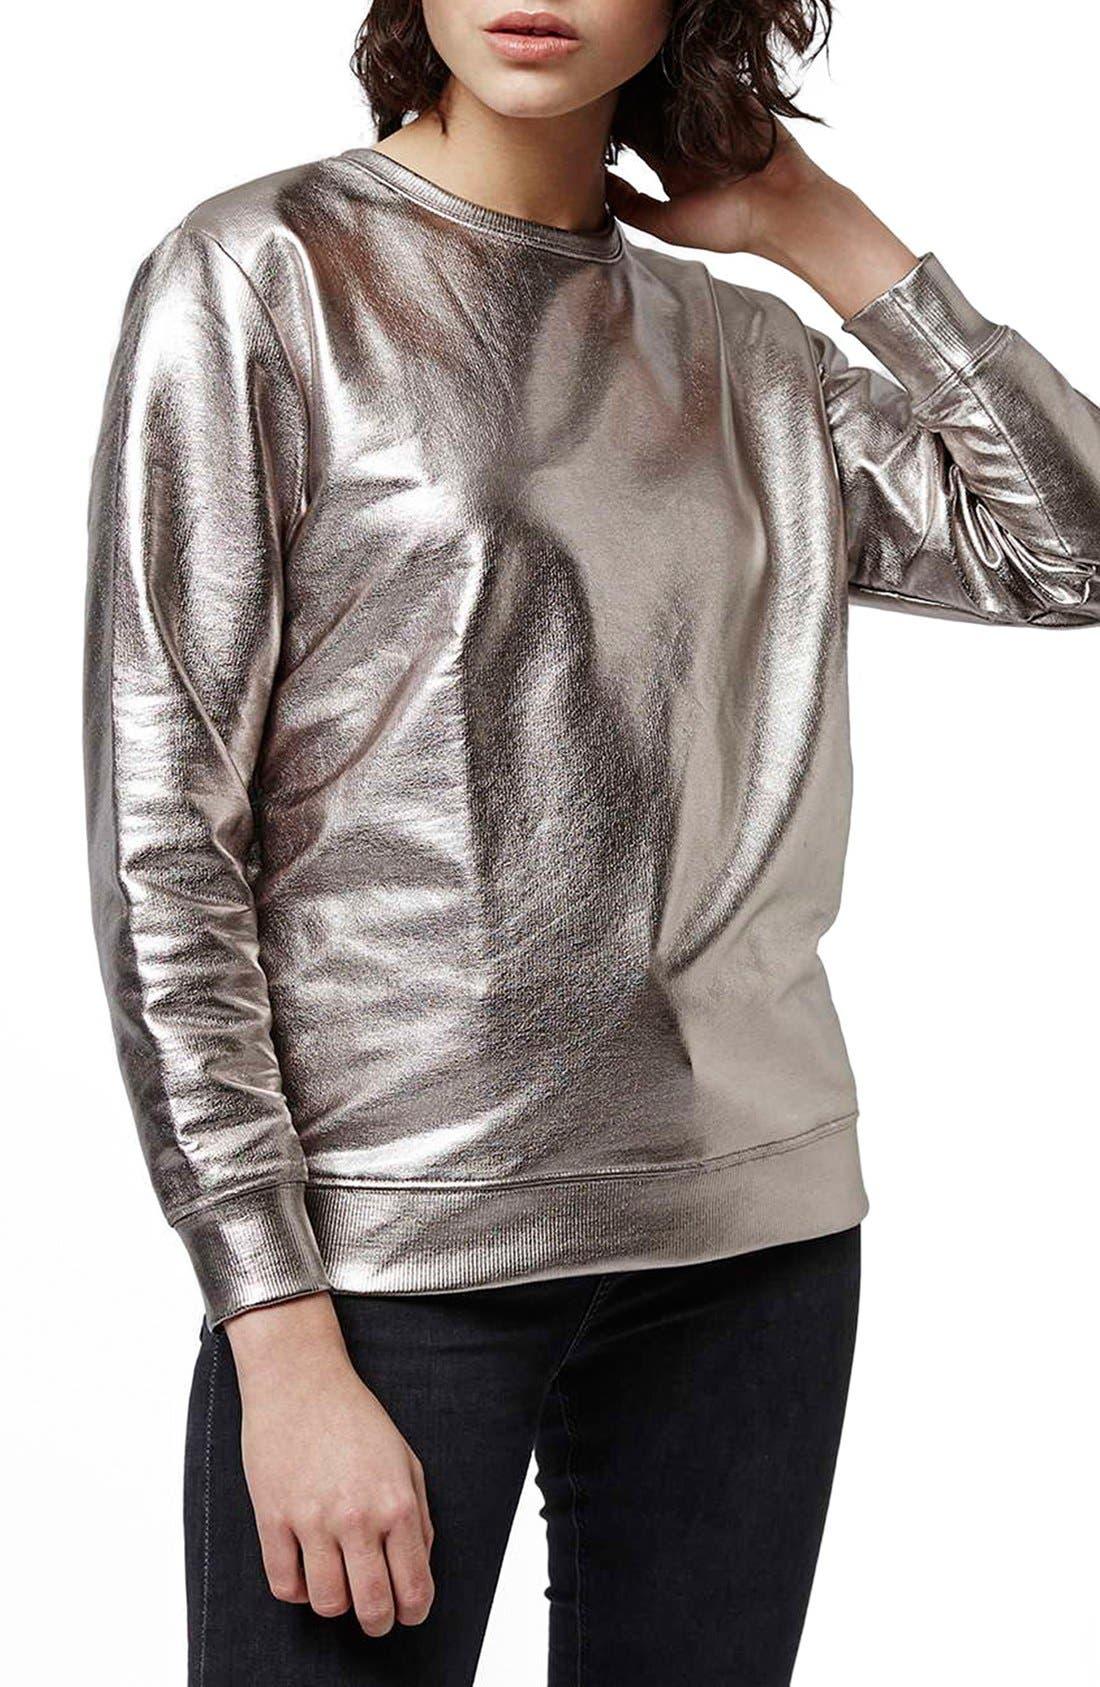 Main Image - Topshop 'Luxe' Foiled Sweatshirt